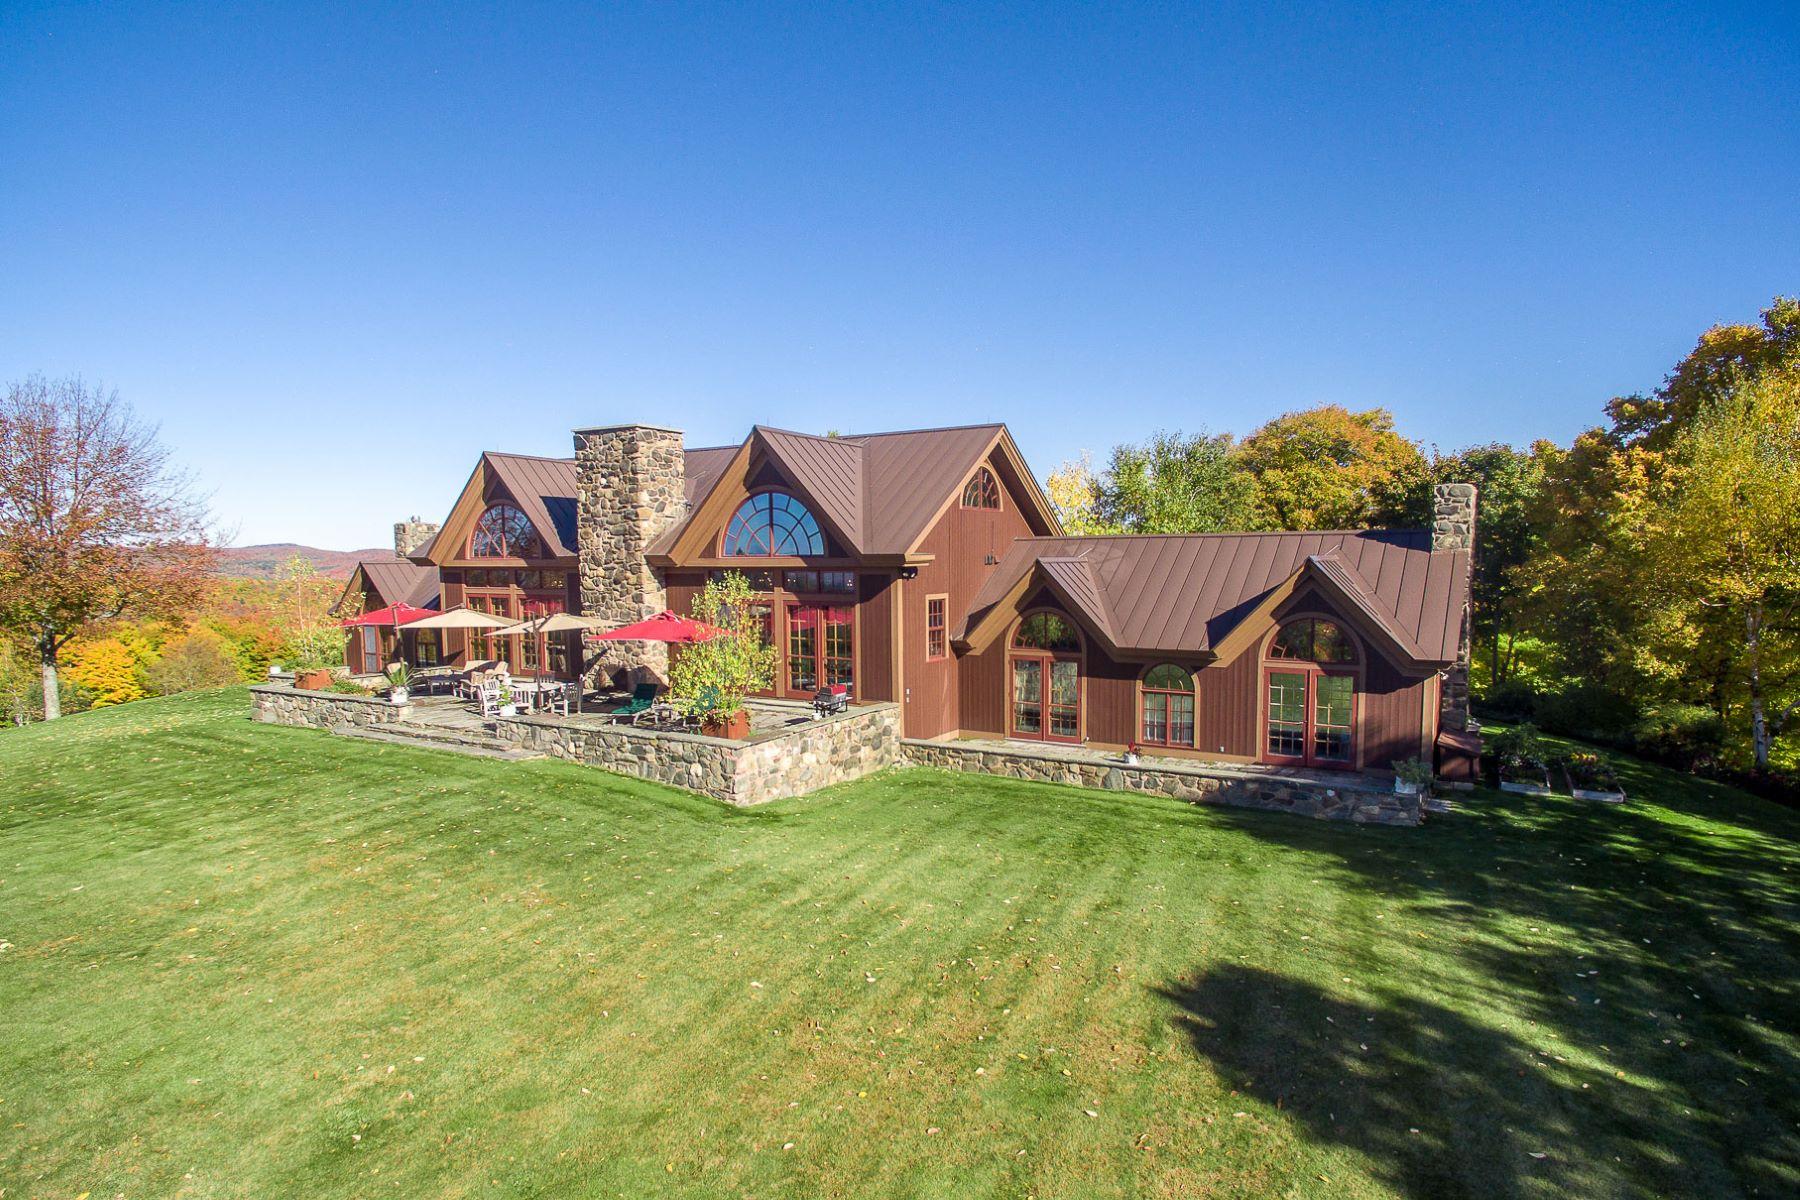 獨棟家庭住宅 為 出售 在 21 Havelok Hill Rd, Strafford Strafford, 佛蒙特州, 05072 美國